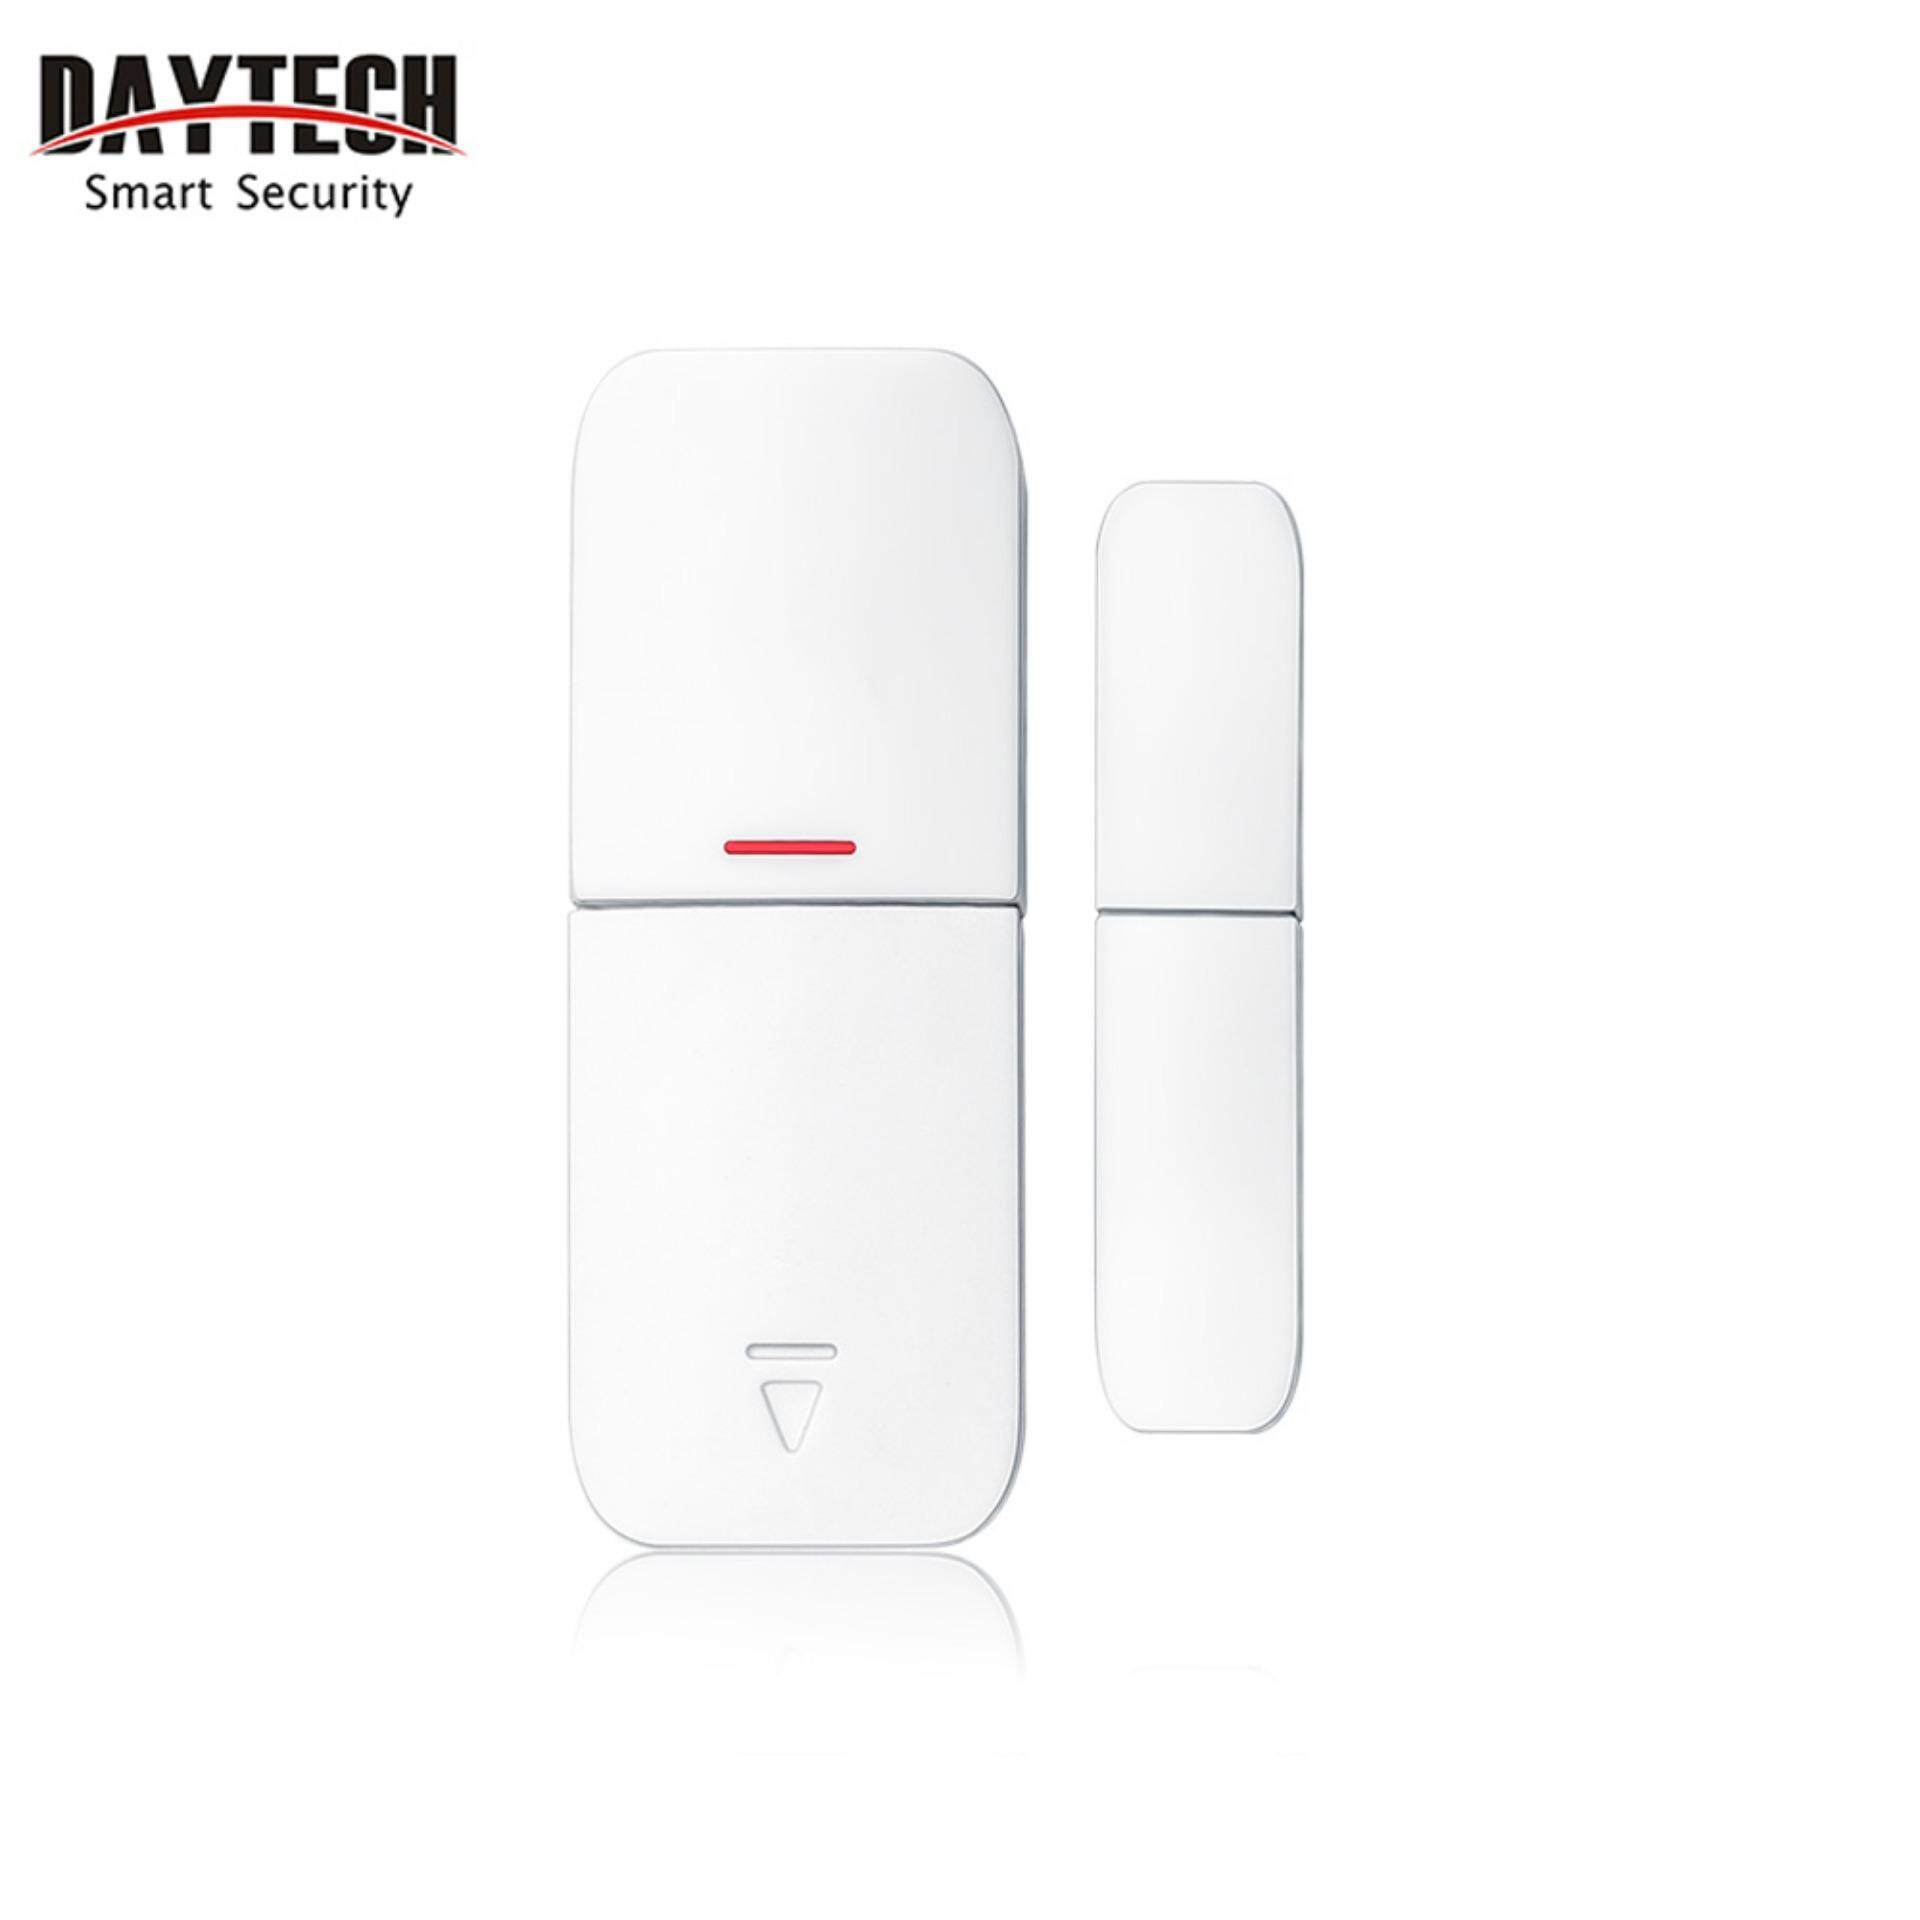 Daytech